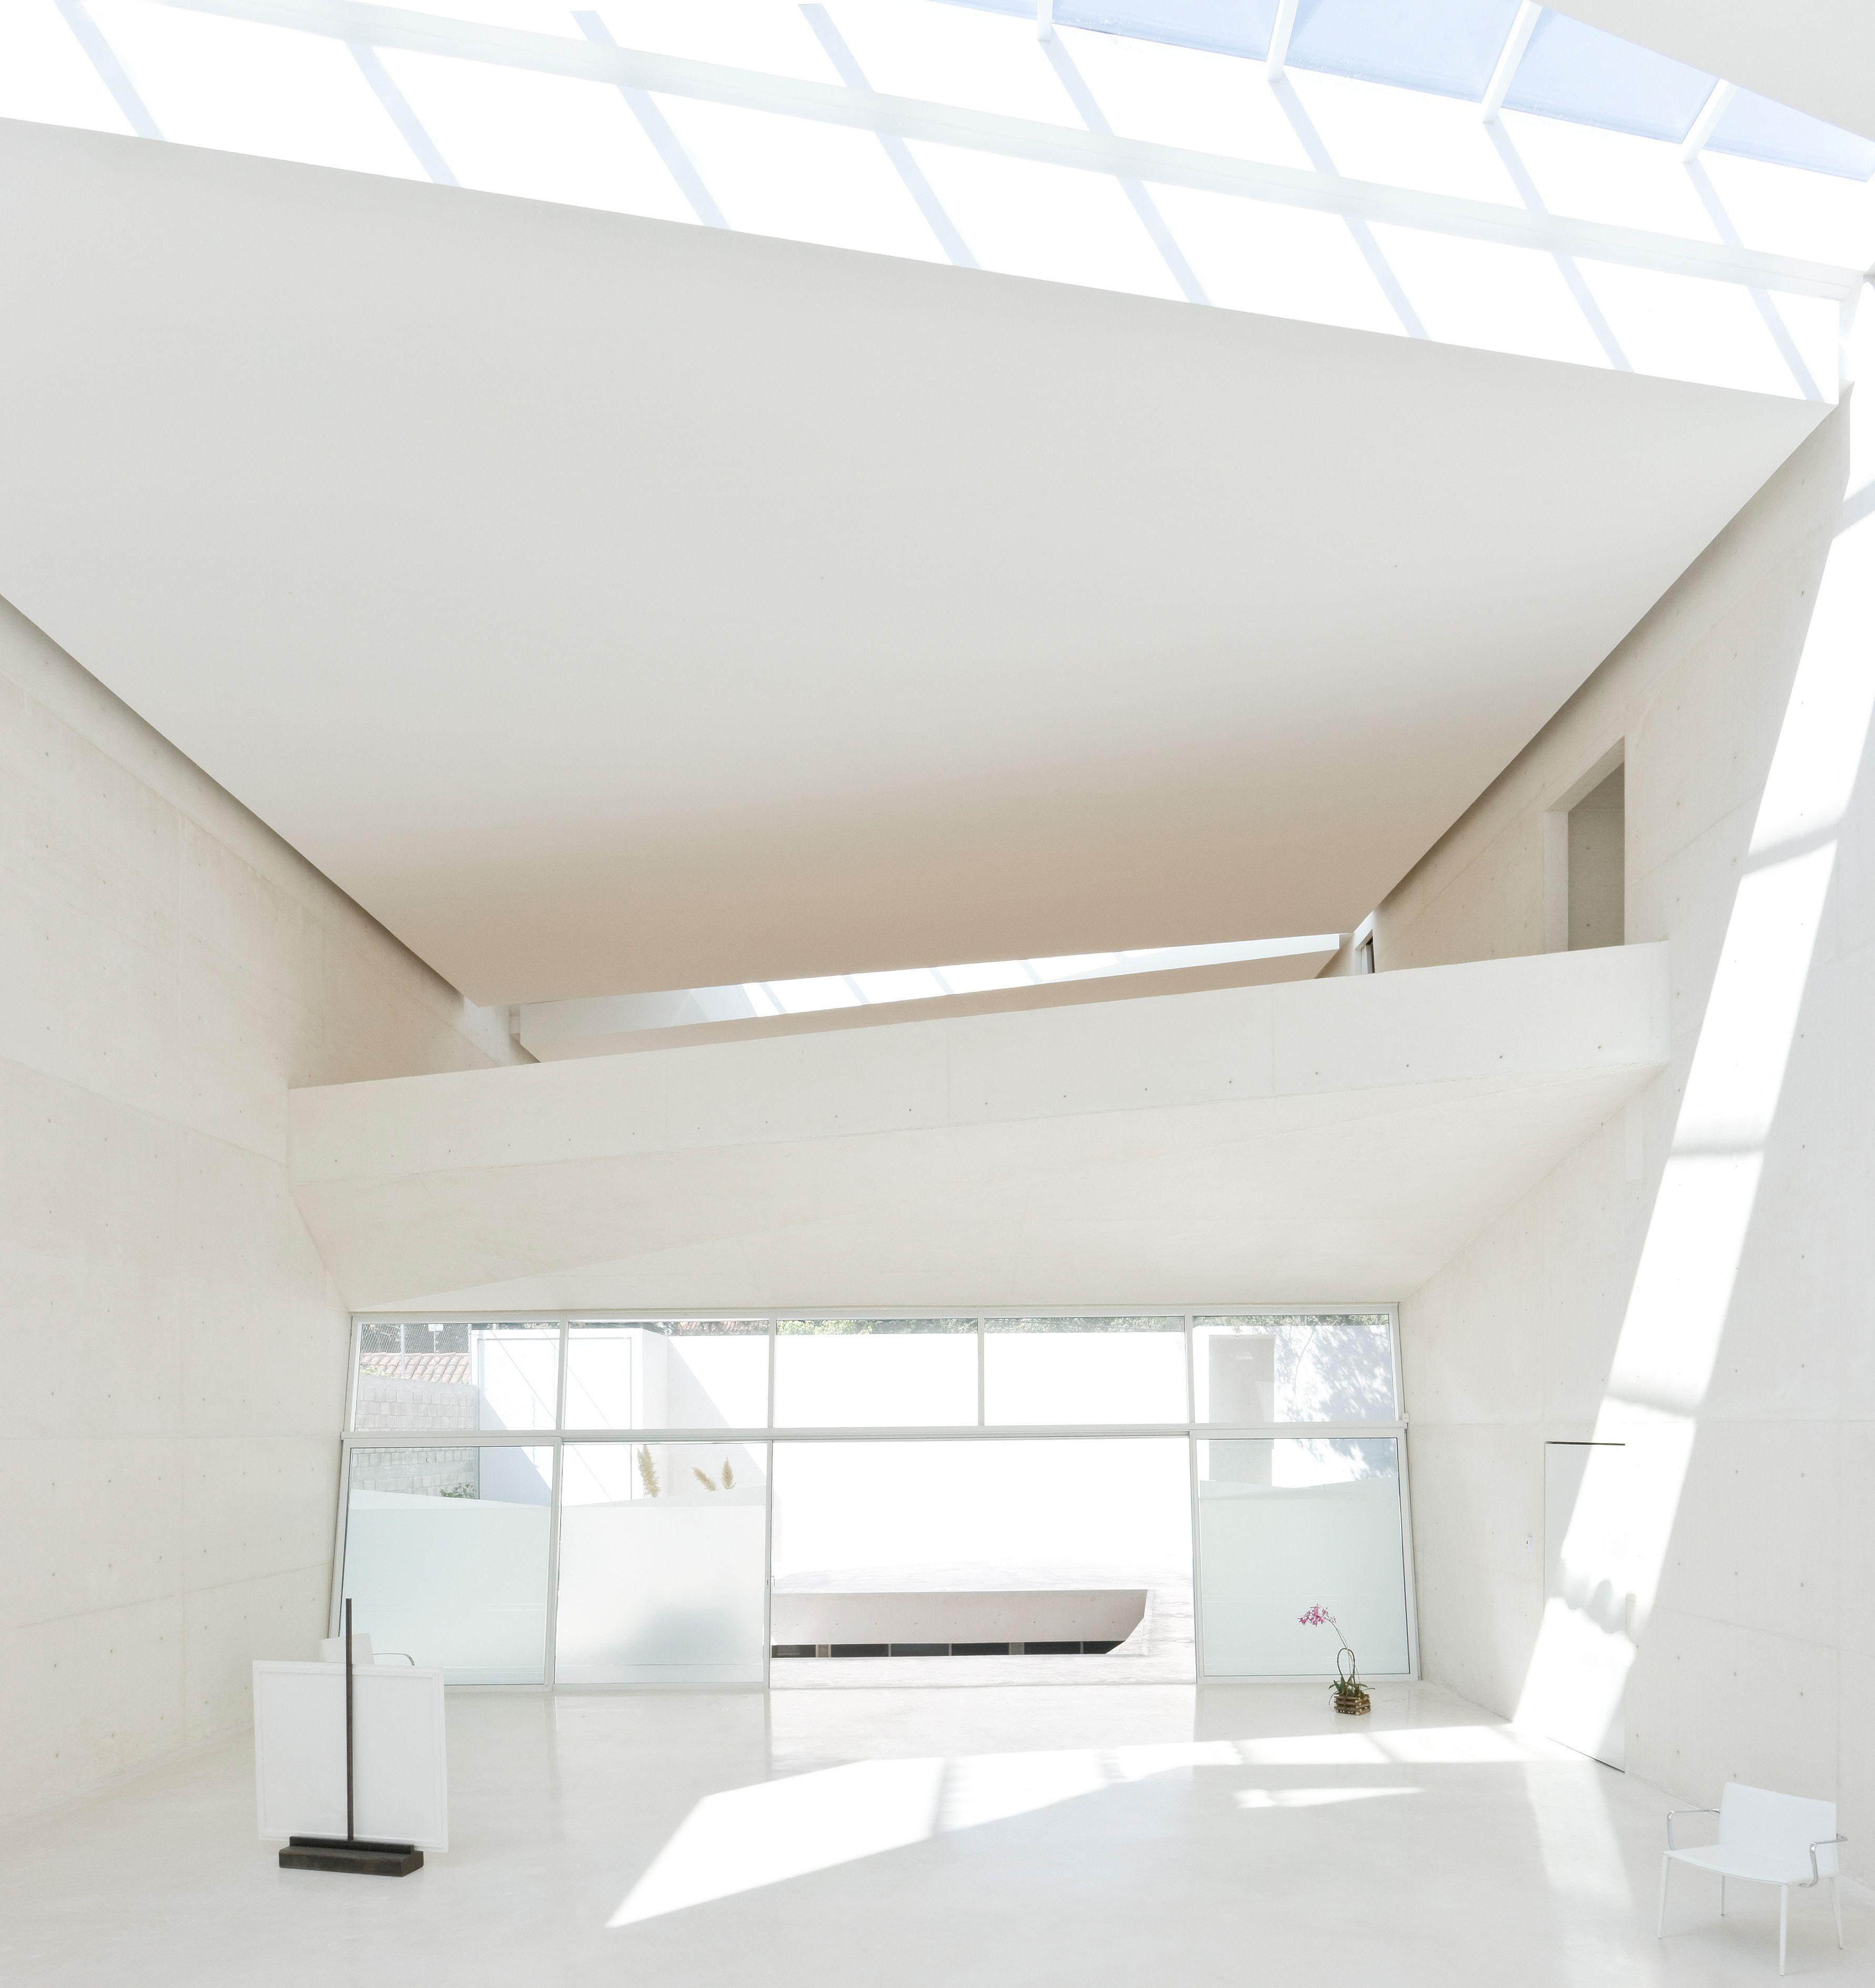 Leibal estudio esplanada by at103 tatiana bilbao - Estudios arquitectura bilbao ...